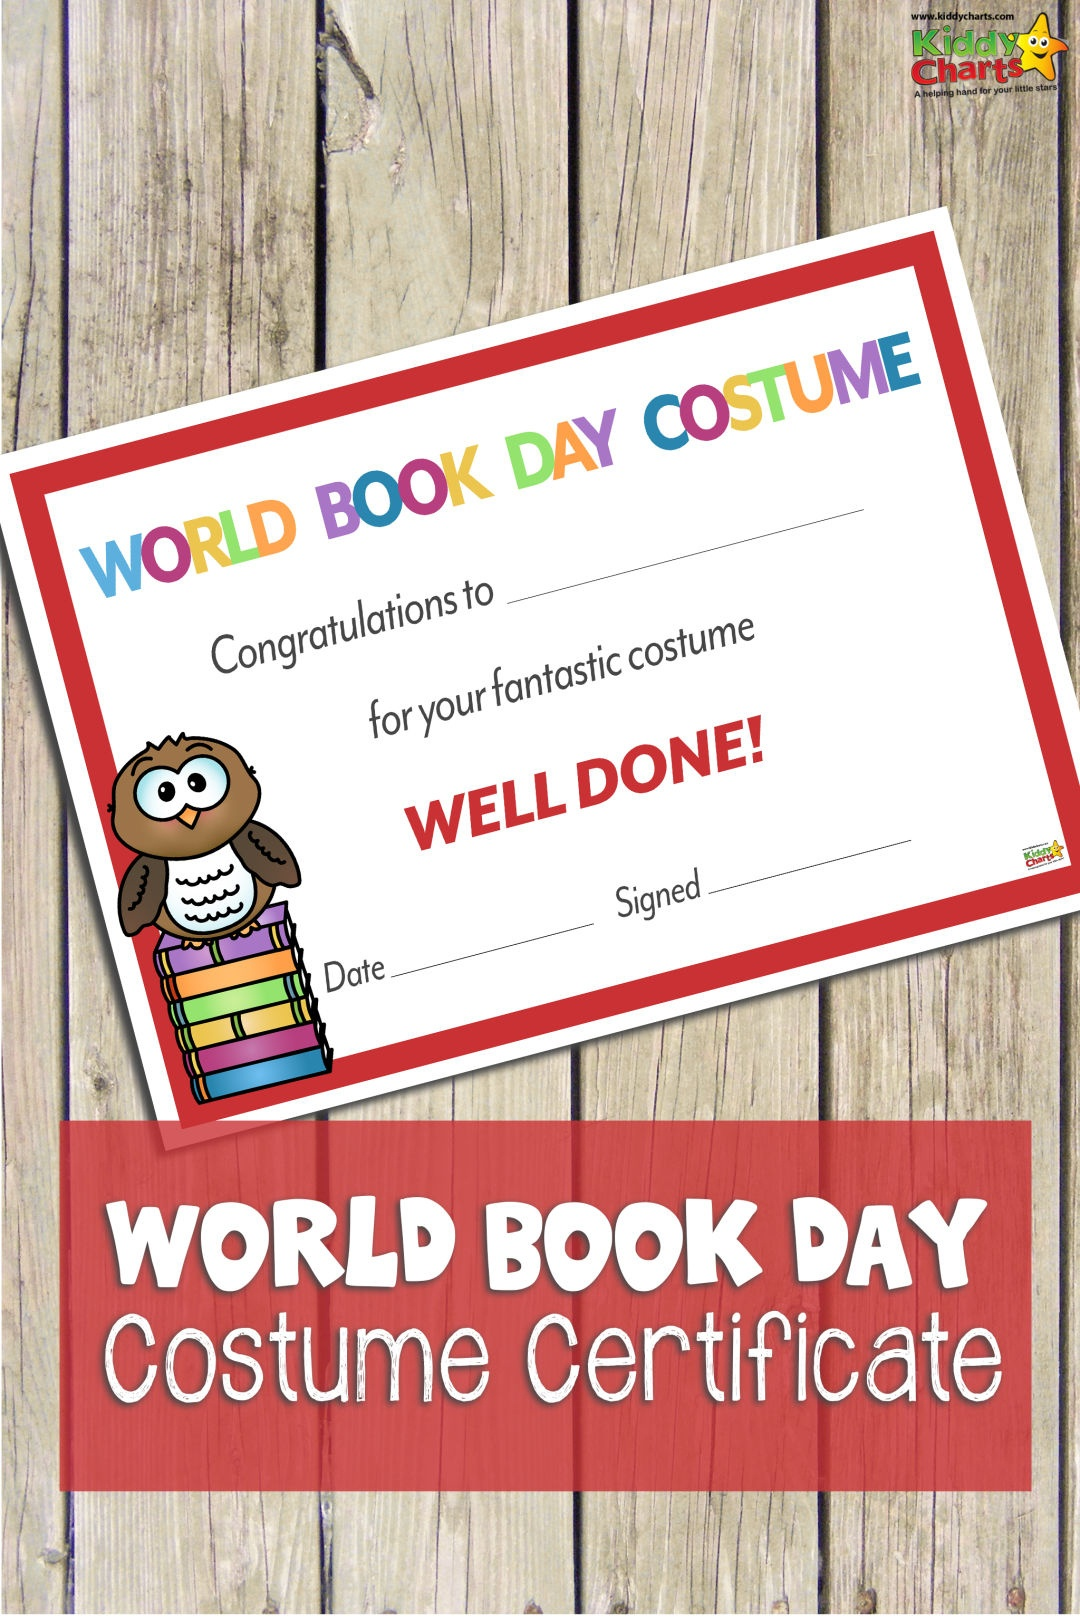 World Book Day Certificate: Best Costume - Best Costume Certificate - Best Costume Certificate Printable Free